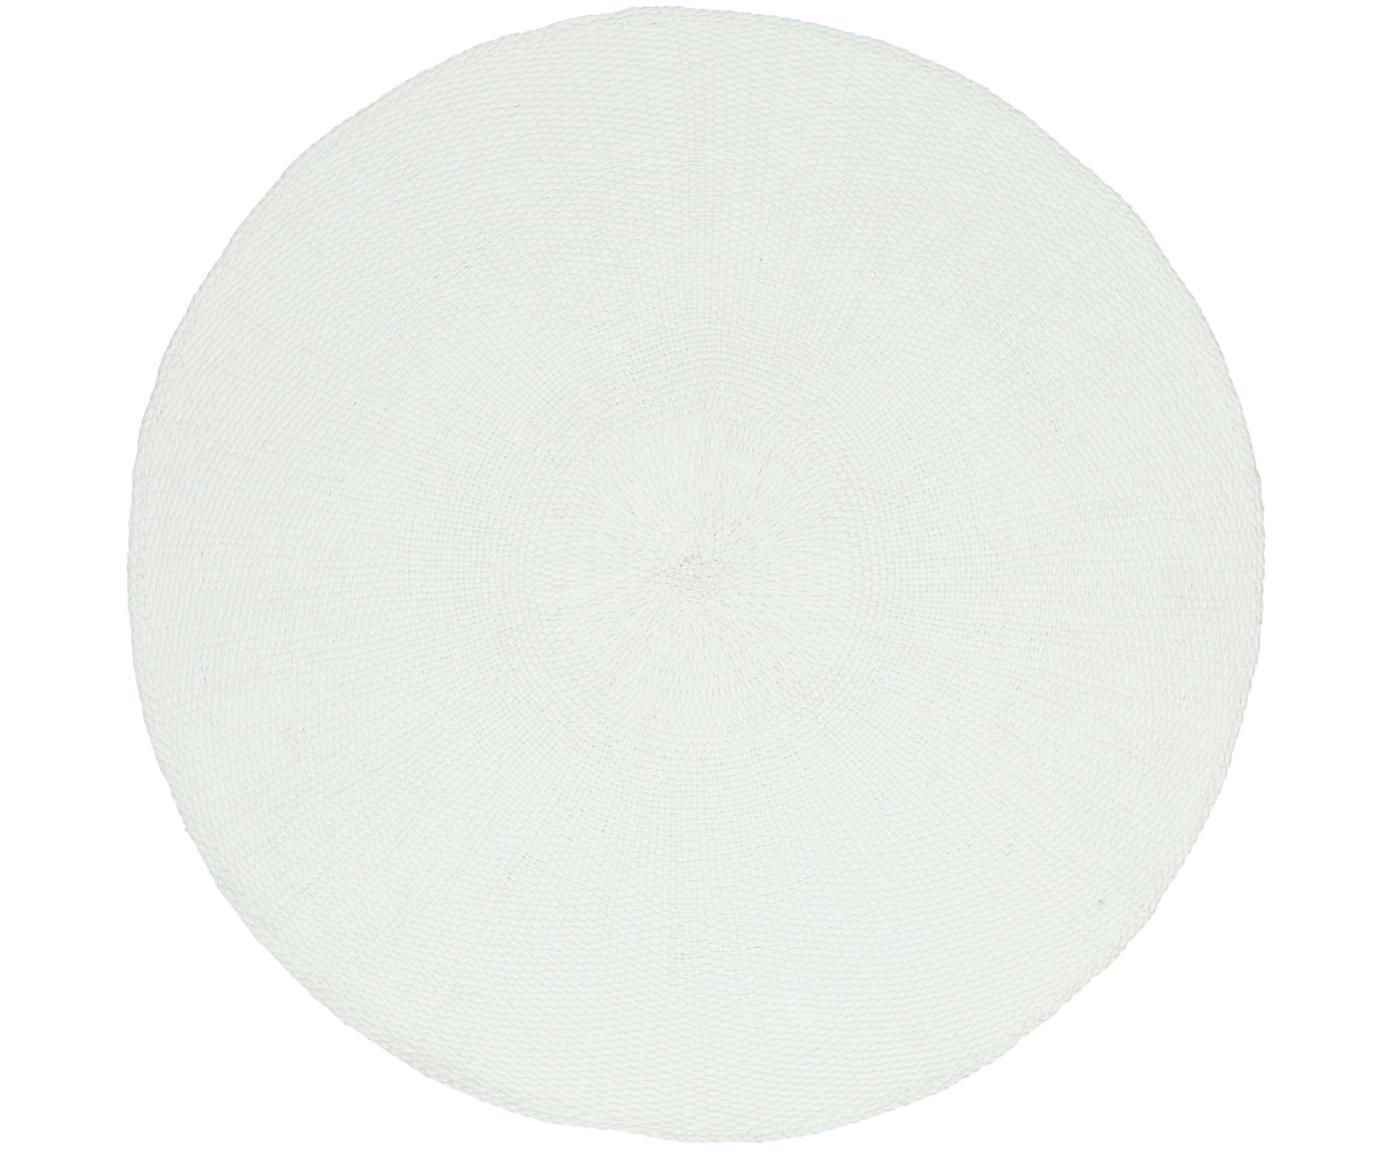 Ronde placemats Kolori, 2 stuks, Papiervezels, Wit, Ø 38 cm